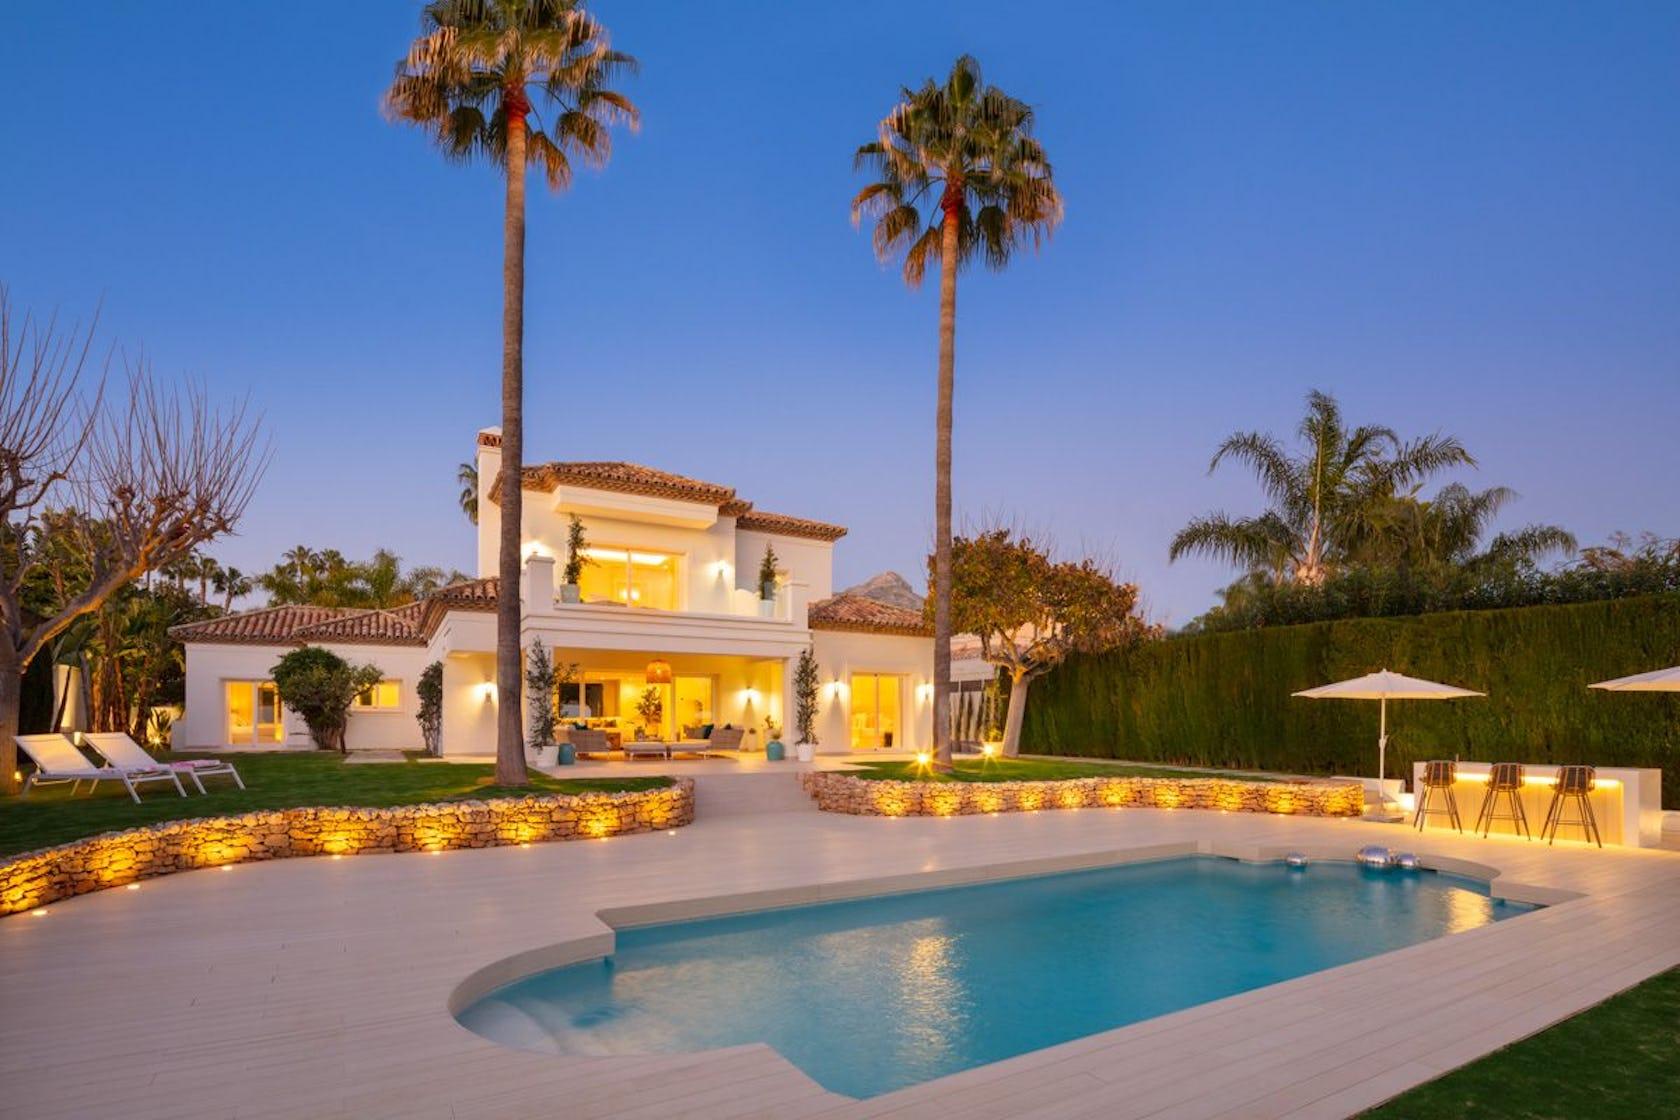 villa building housing house hotel pool water resort mansion